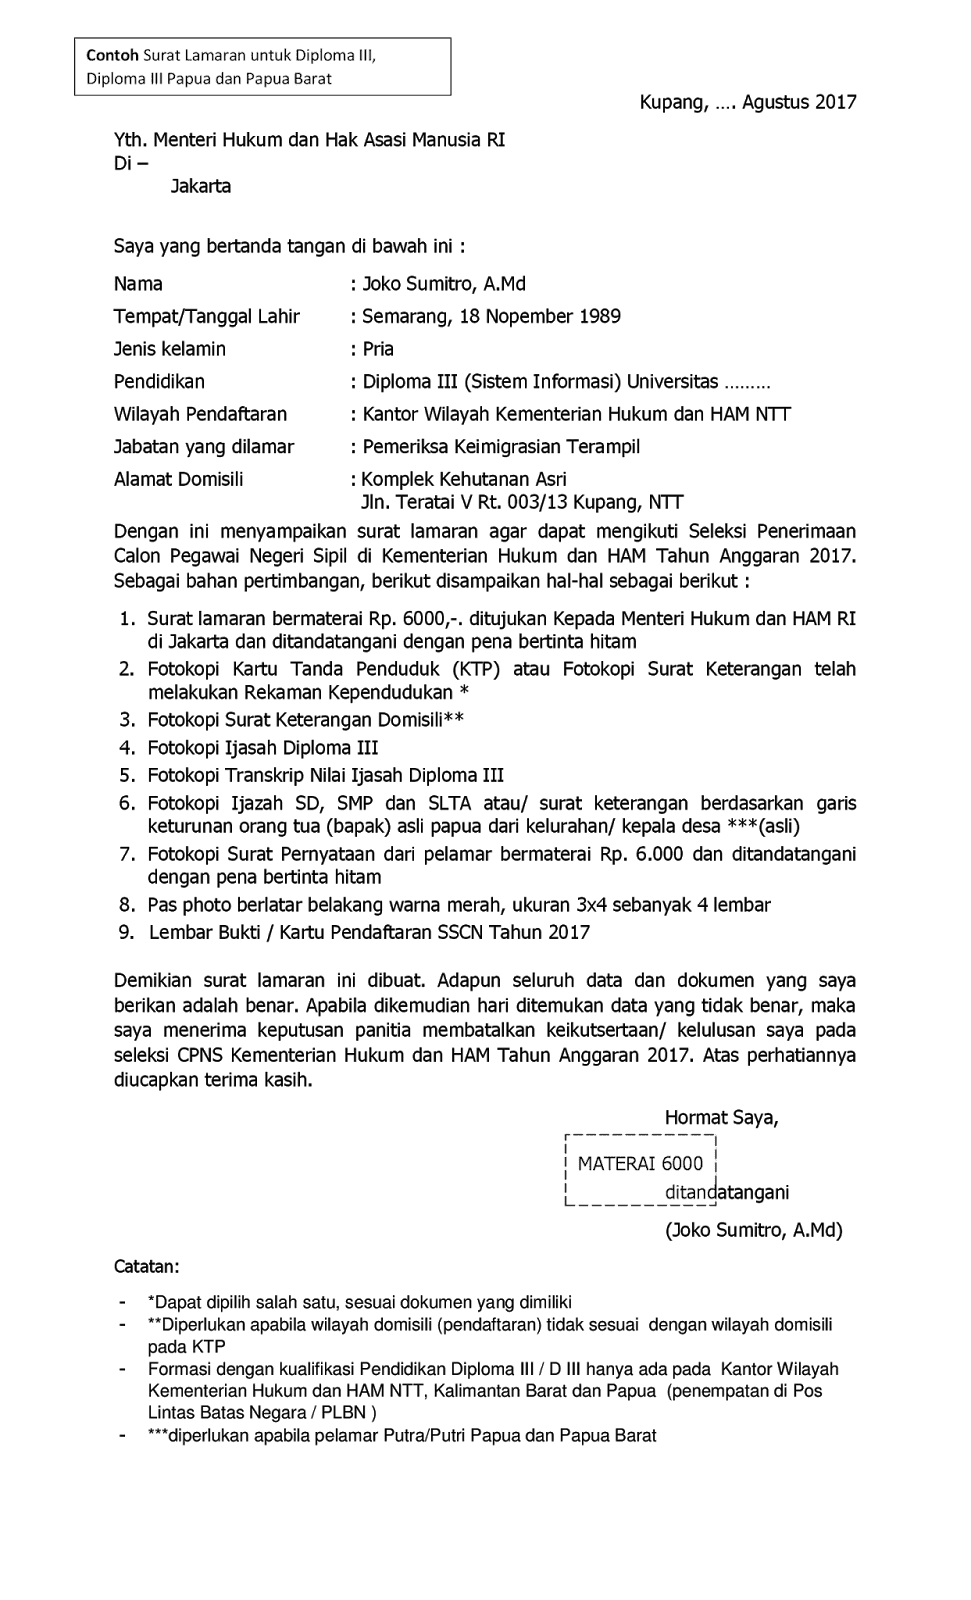 format contoh surat lamaran cpns kementerian hukum dan ham